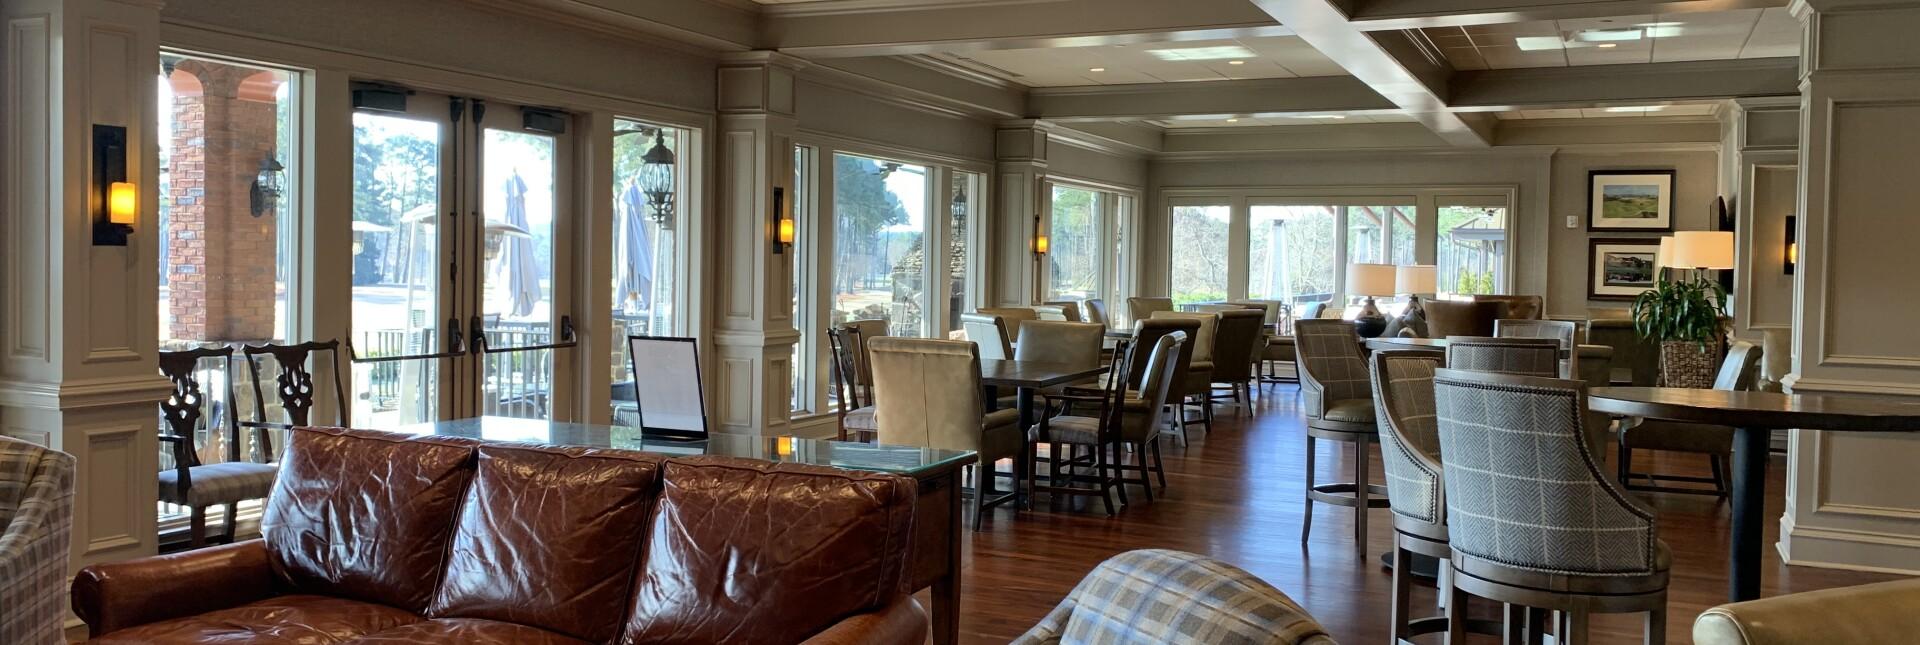 Stirling Club - Interlachen Lounge 1.jpg